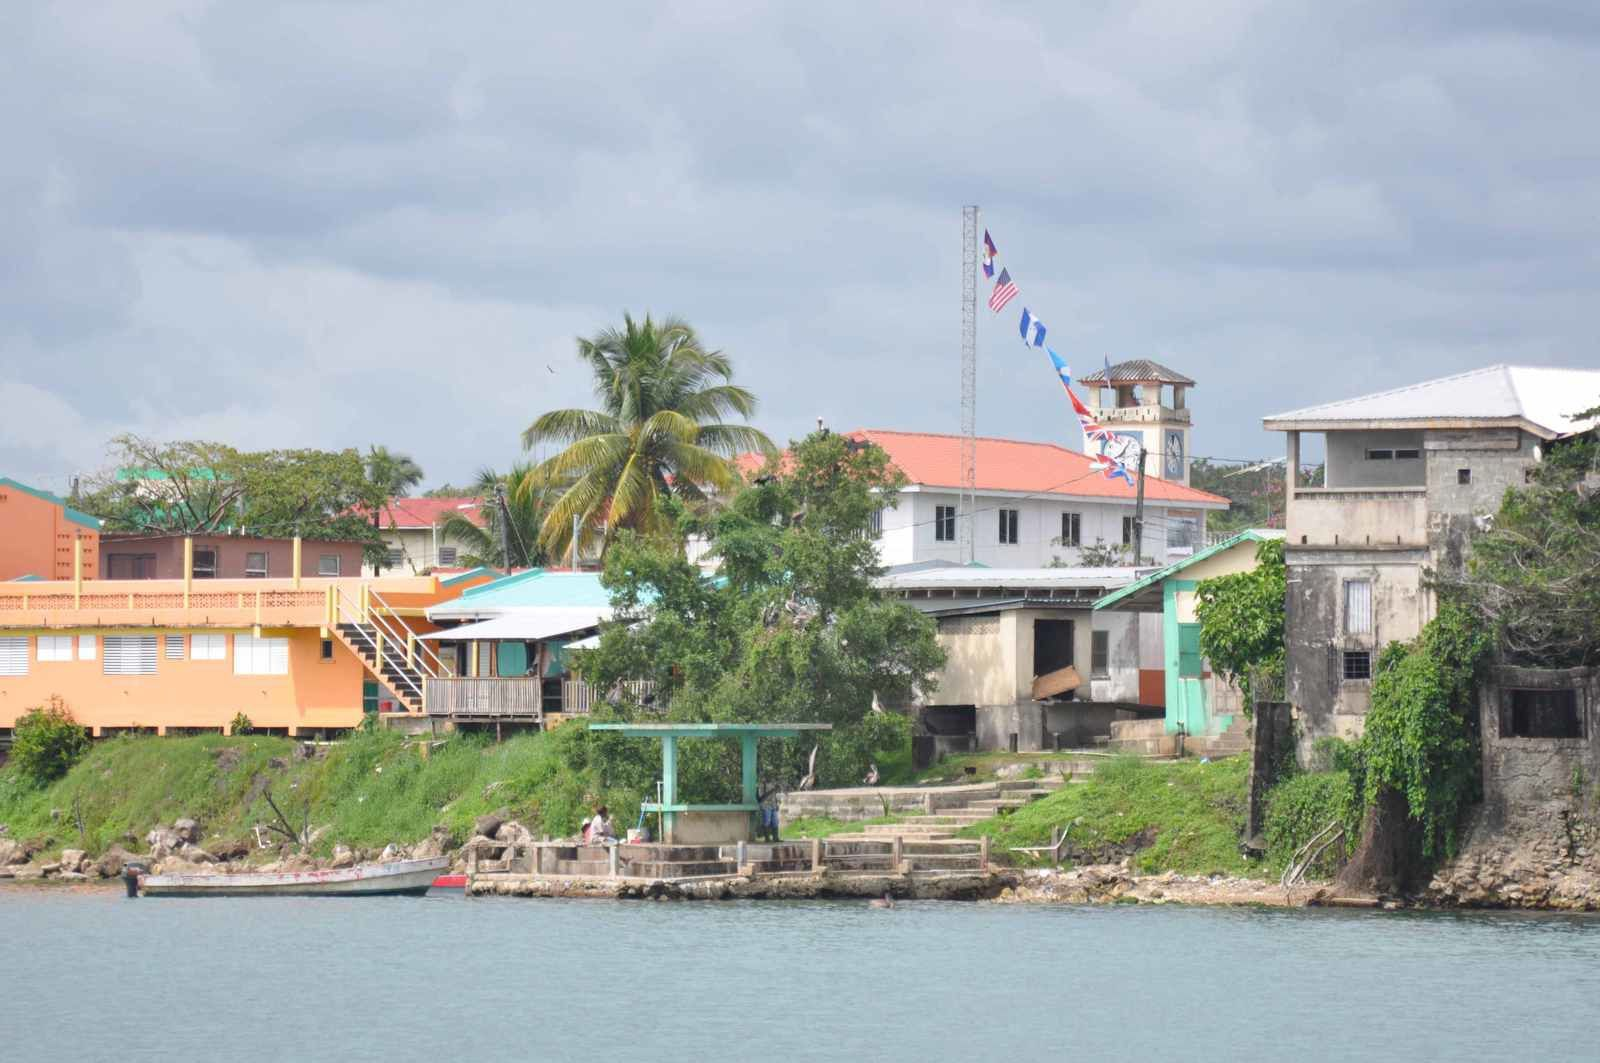 Punta Gorda : vos papiers ,svp!